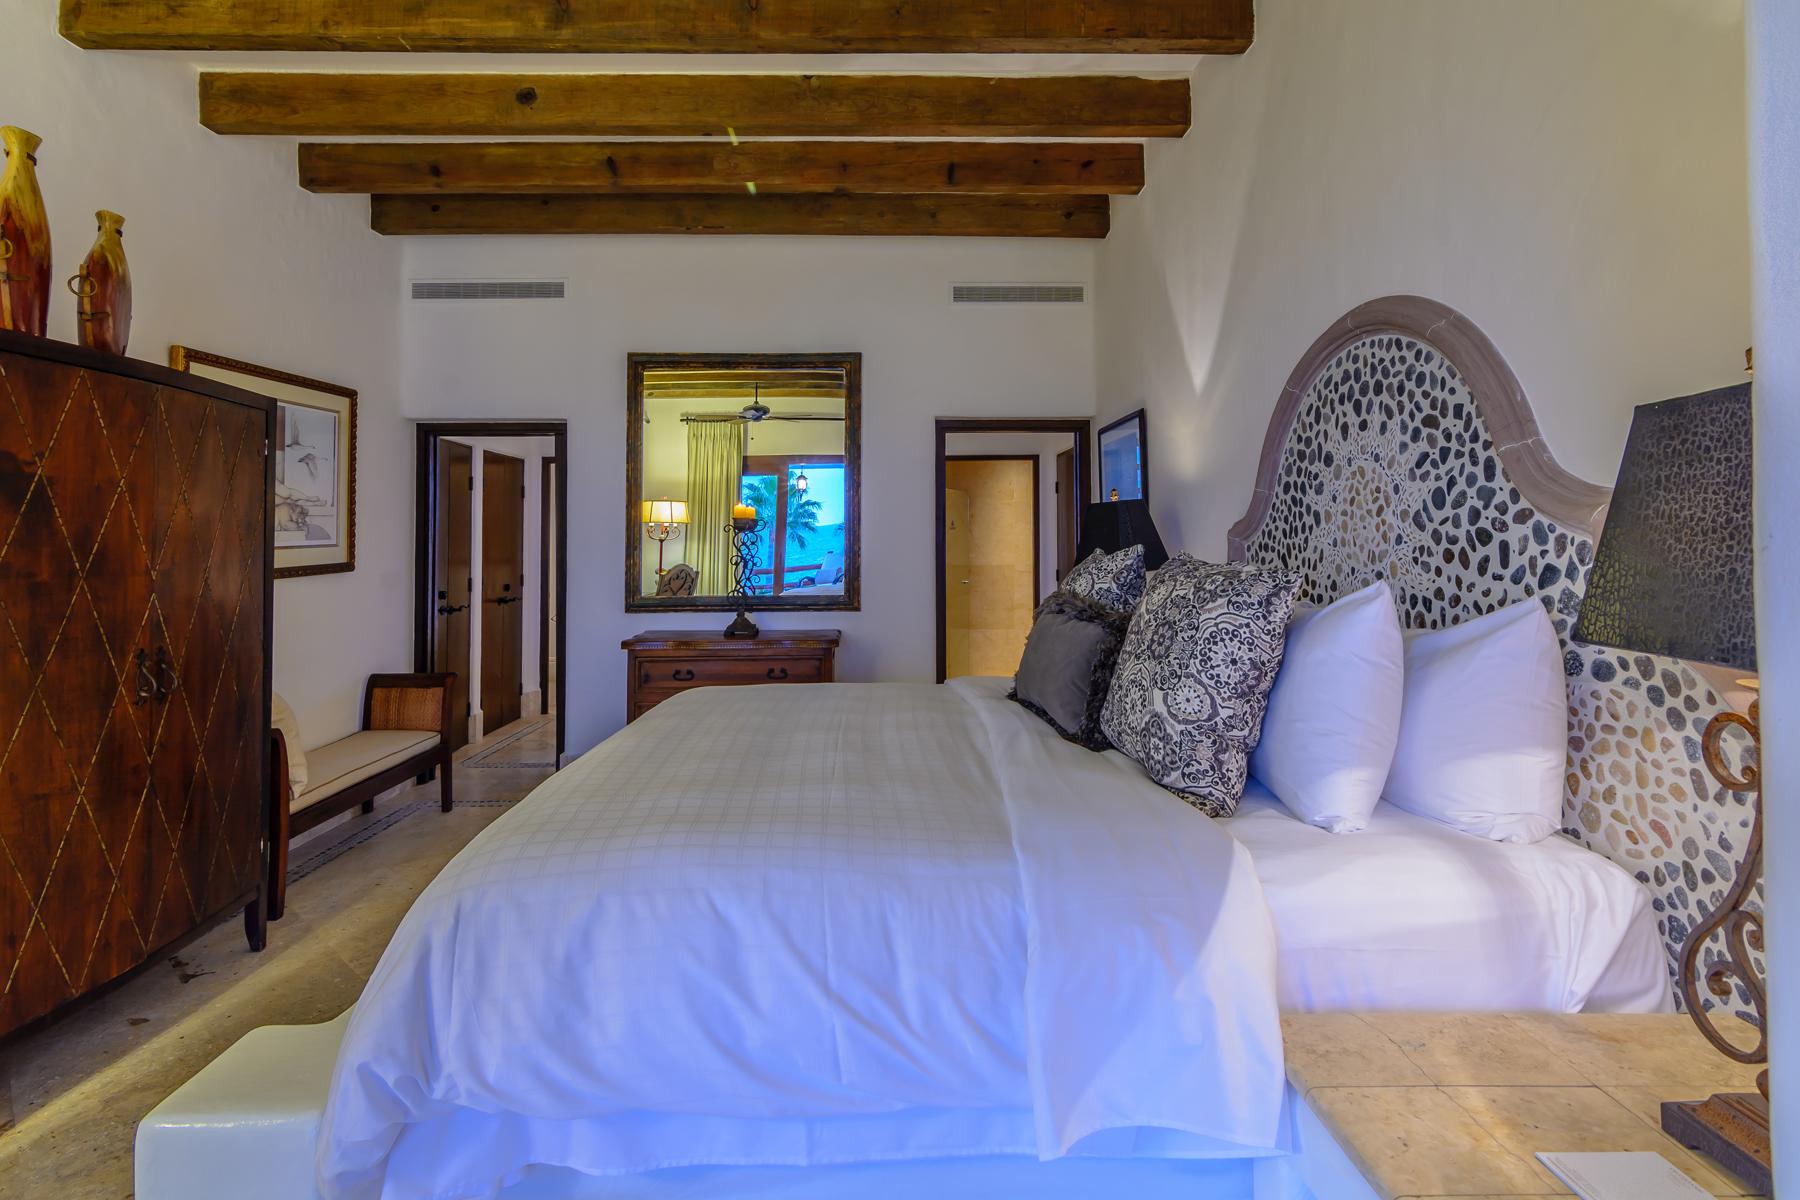 Additional photo for property listing at Las Ventanas al Paraíso Residence 1303 San Jose Del Cabo, Baja California Sur México